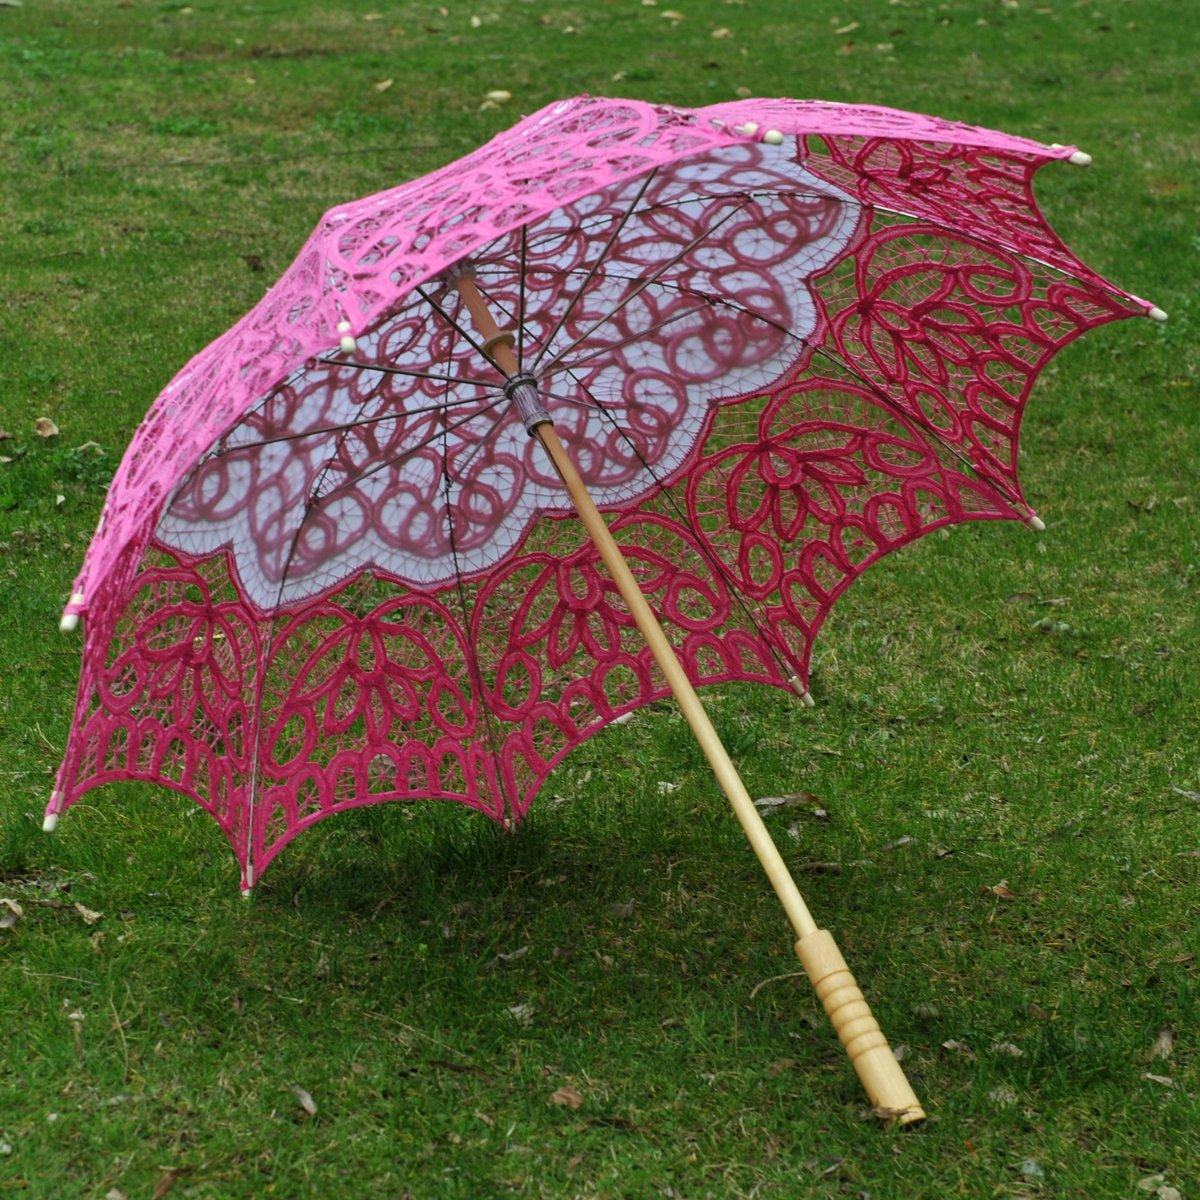 Topwedding Classic Cotton Lace Parasol Umbrella Bridal Shower Decoration, Fuschia by Topwedding (Image #5)